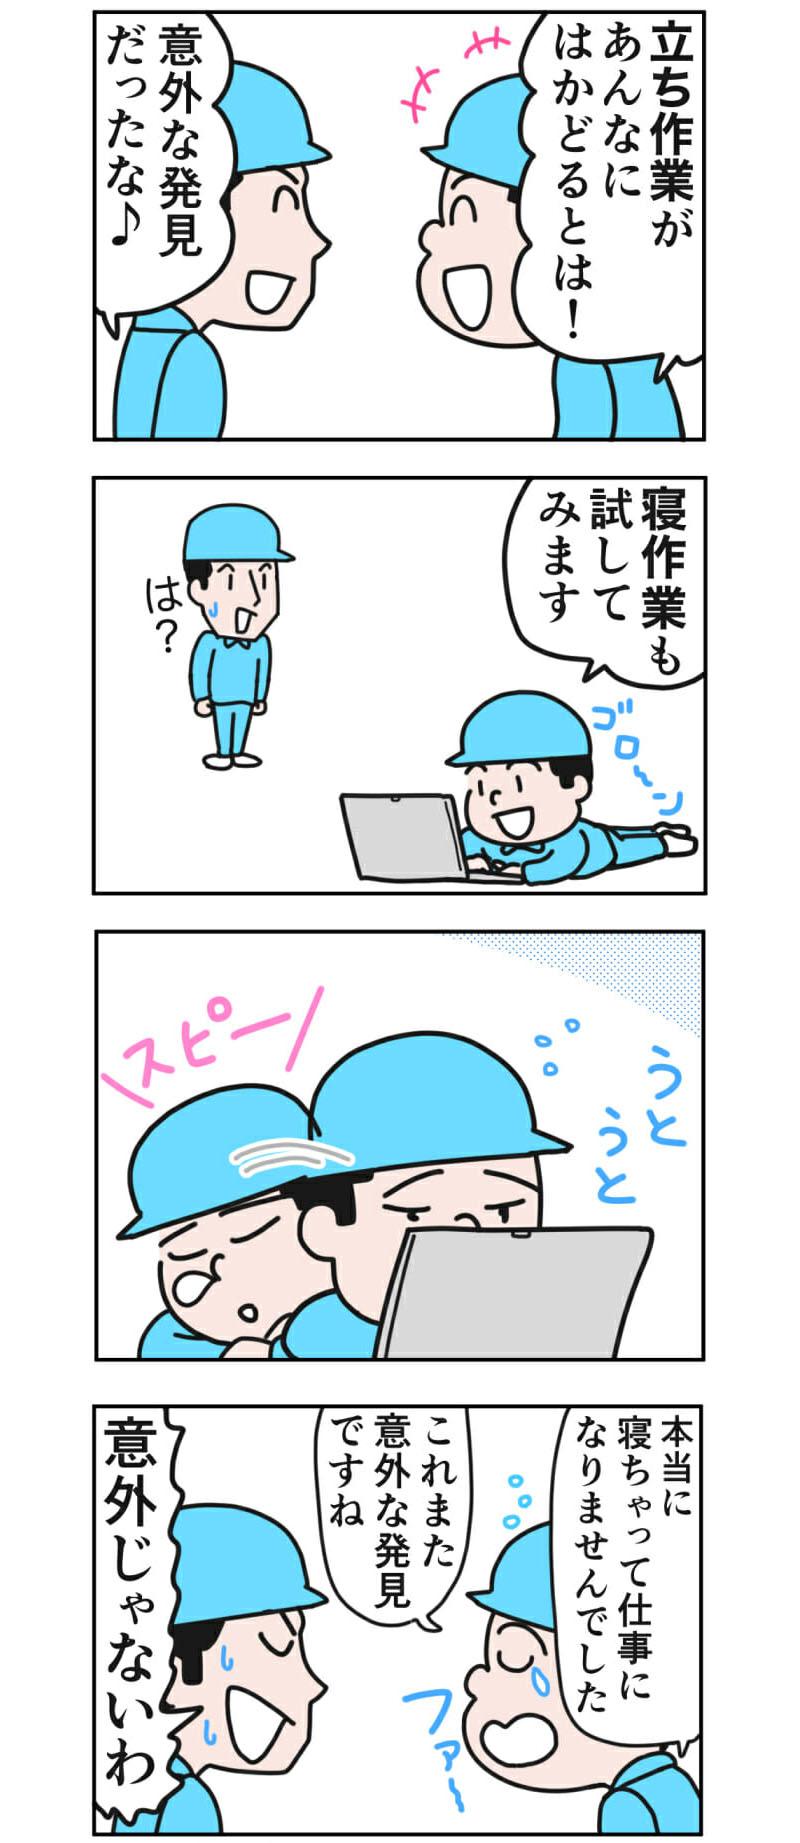 kaizen_123